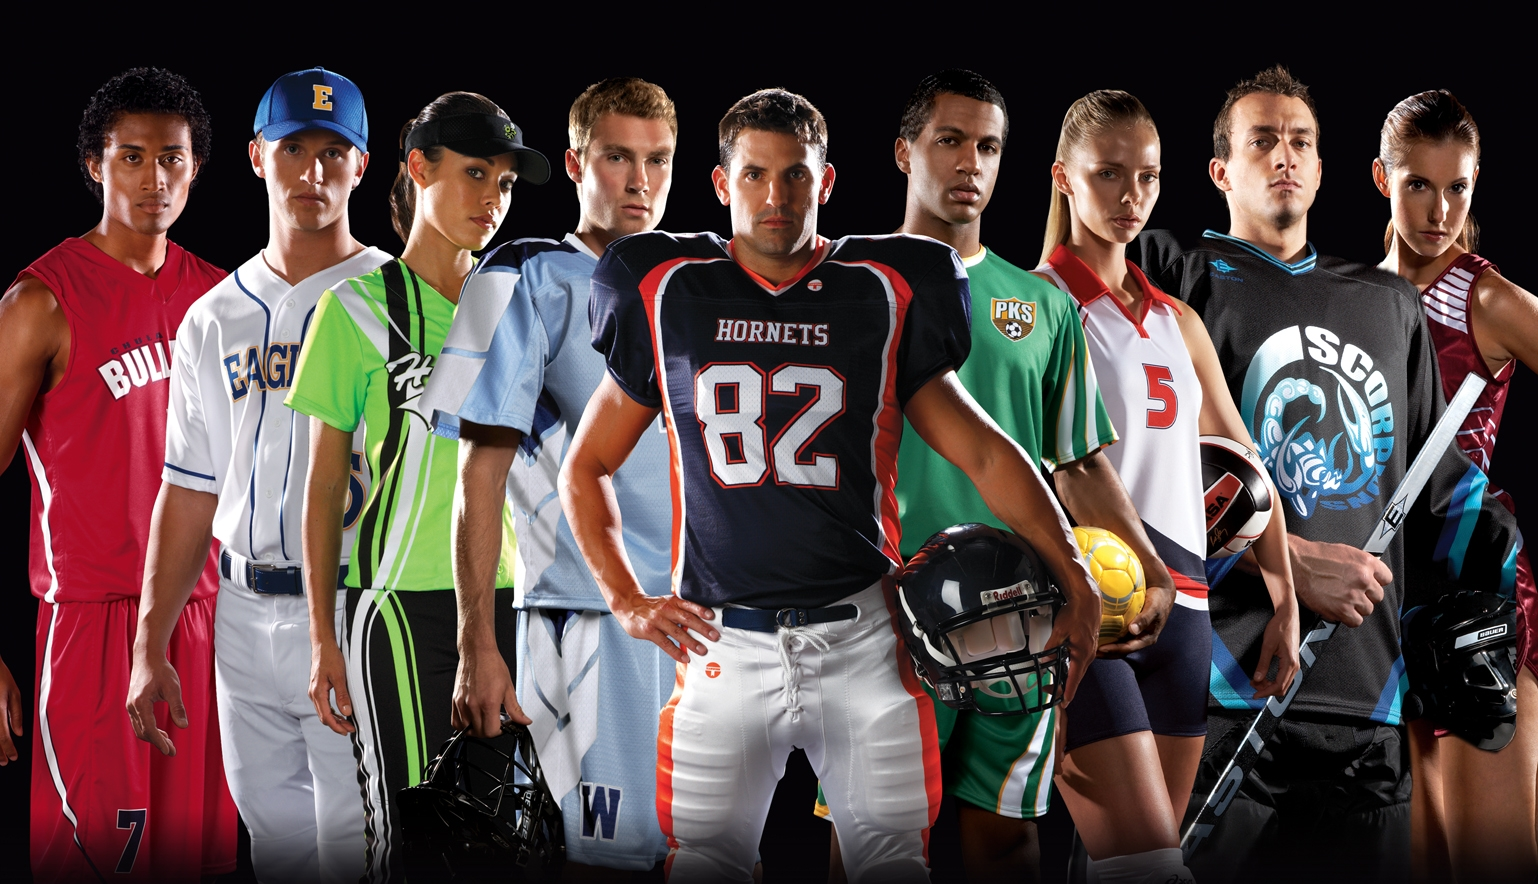 high-school-sports-team-sportswear_982760.jpg